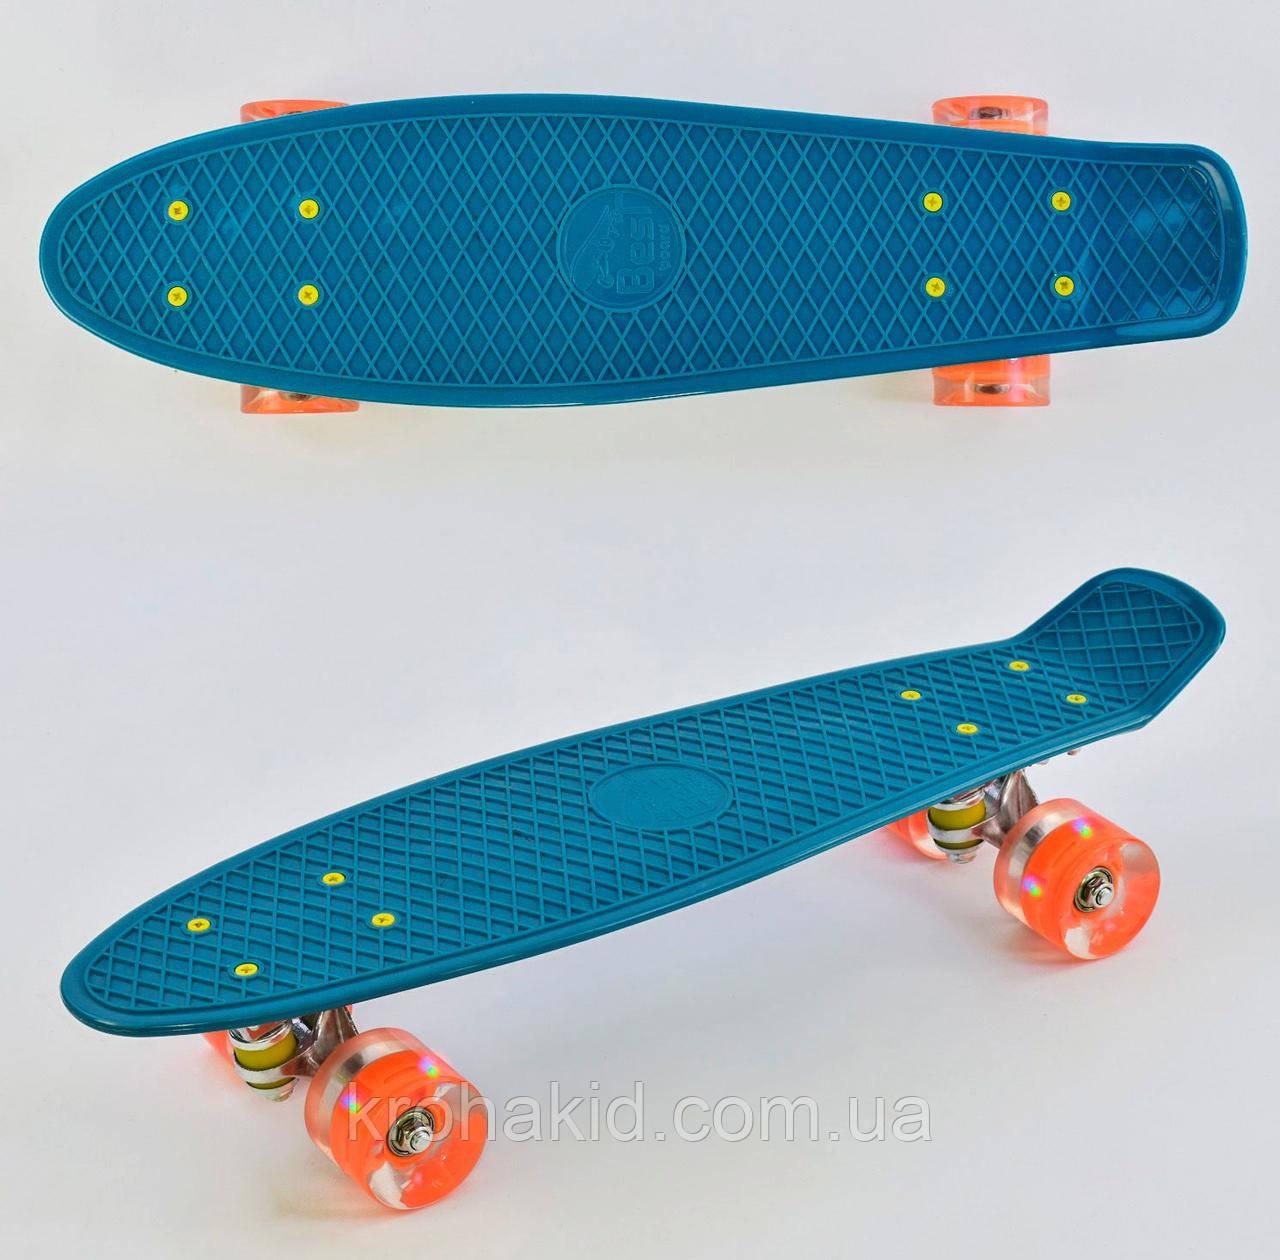 Скейт Пенни борд 3030 Best Board, БИРЮЗОВЫЙ ,  доска=55см, колёса PU d=6см СВЕТЯТСЯ